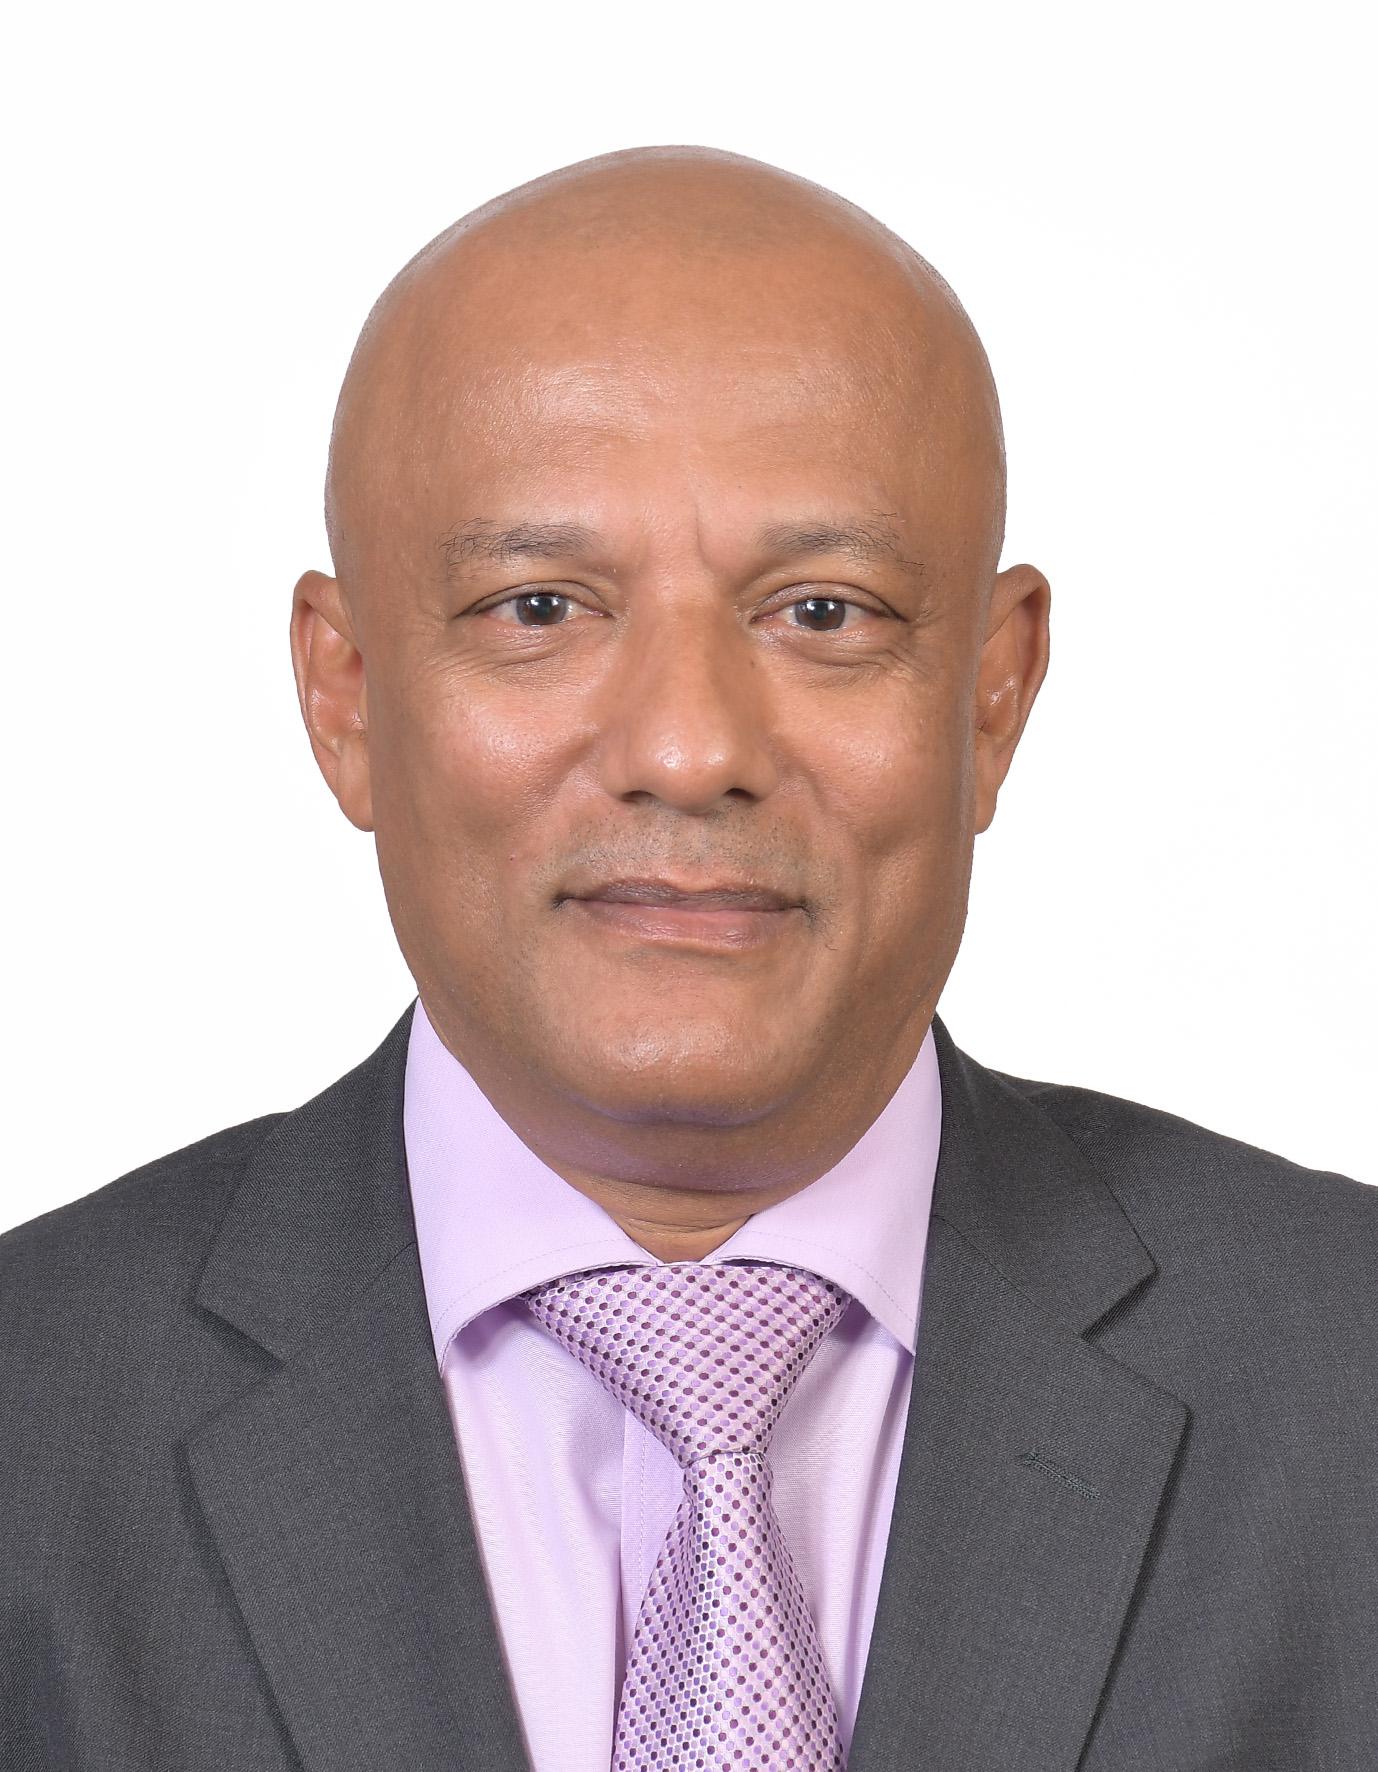 Mr. Twalib Abdallah Mbarak, CBS